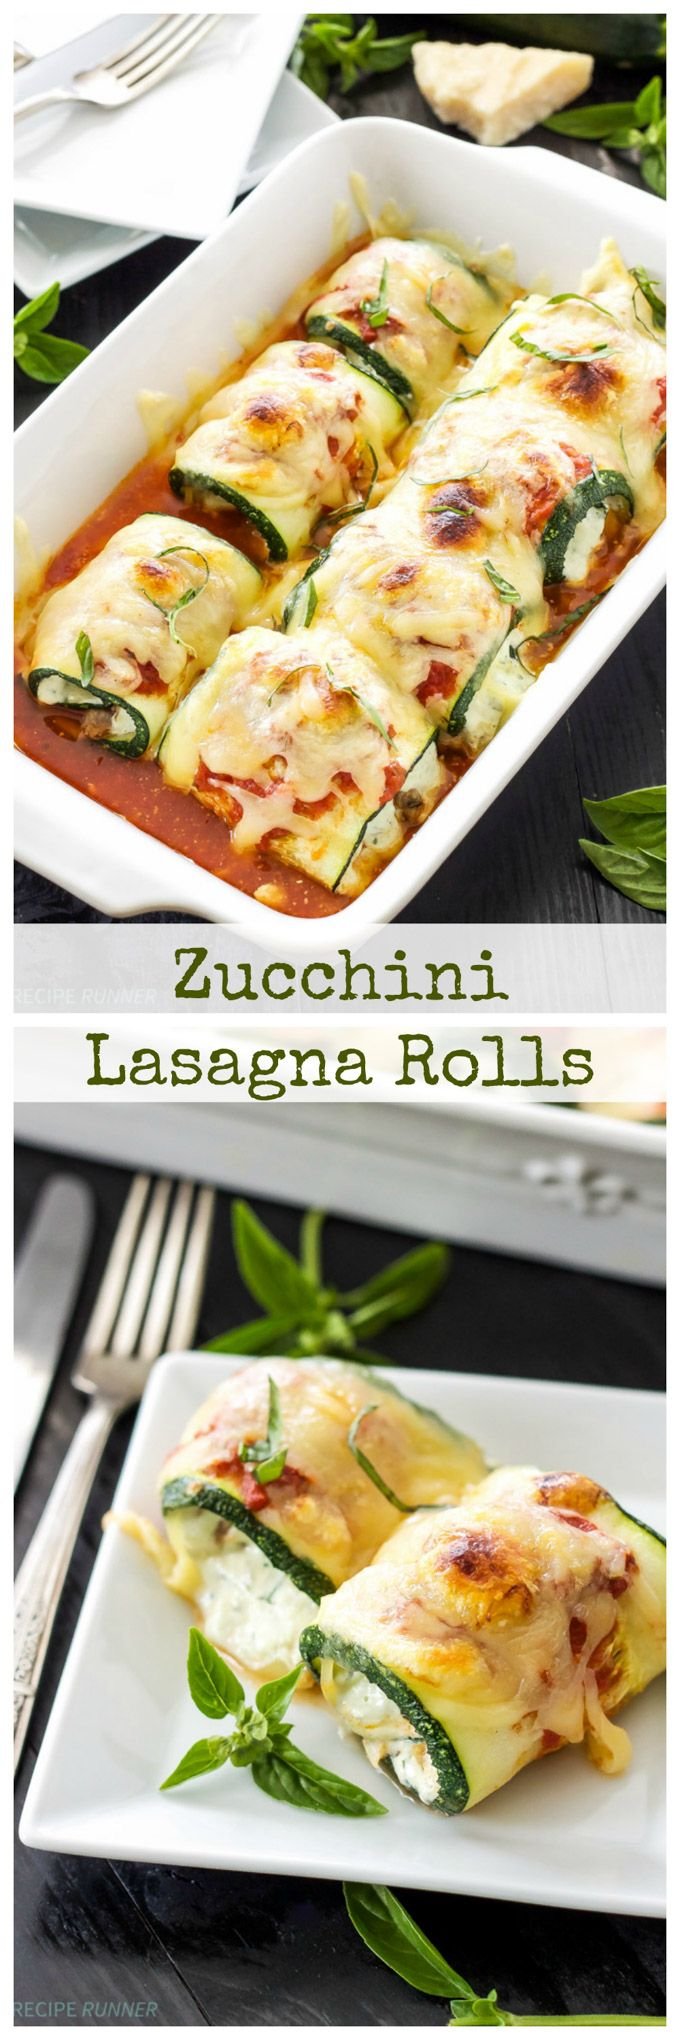 Zucchini Lasagna Rolls | Use zucchini instead of pasta in this healthy, gluten free lasagna recipe!: